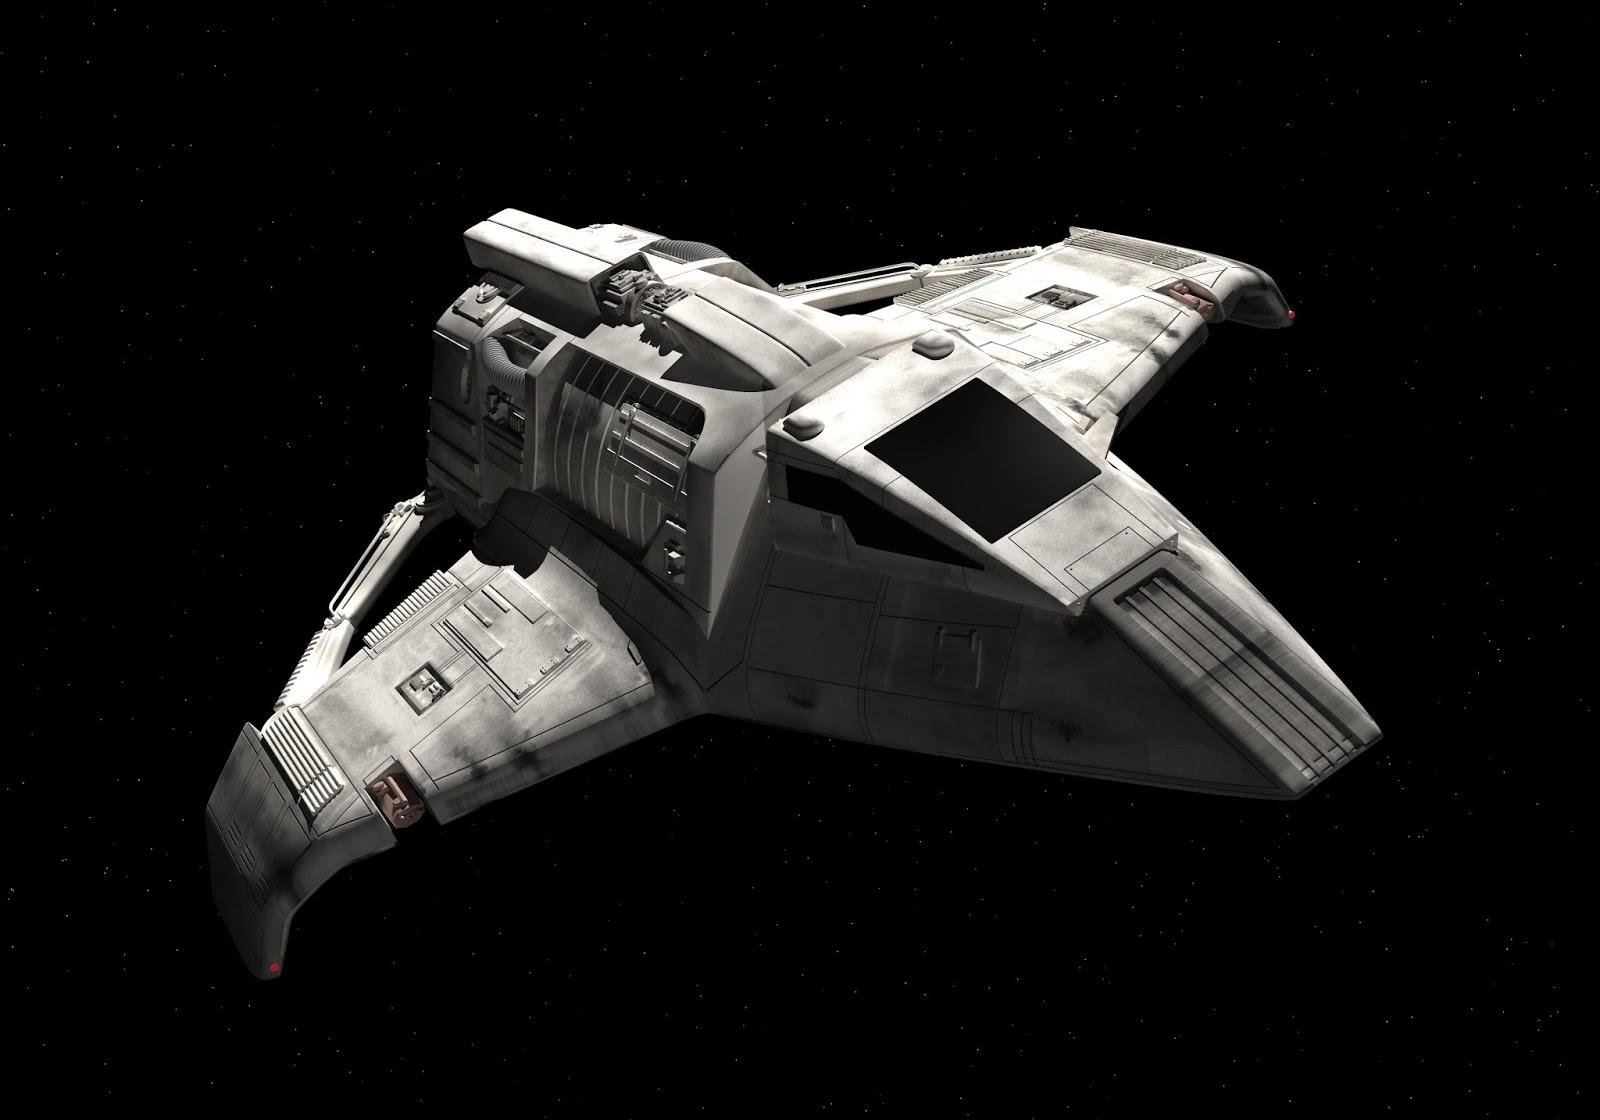 STAR TREK EAGLEMOSS OFFICIAL STARSHIPS COLLECTION #76 BAXIAL NEELIX SHUTTLE SHIP